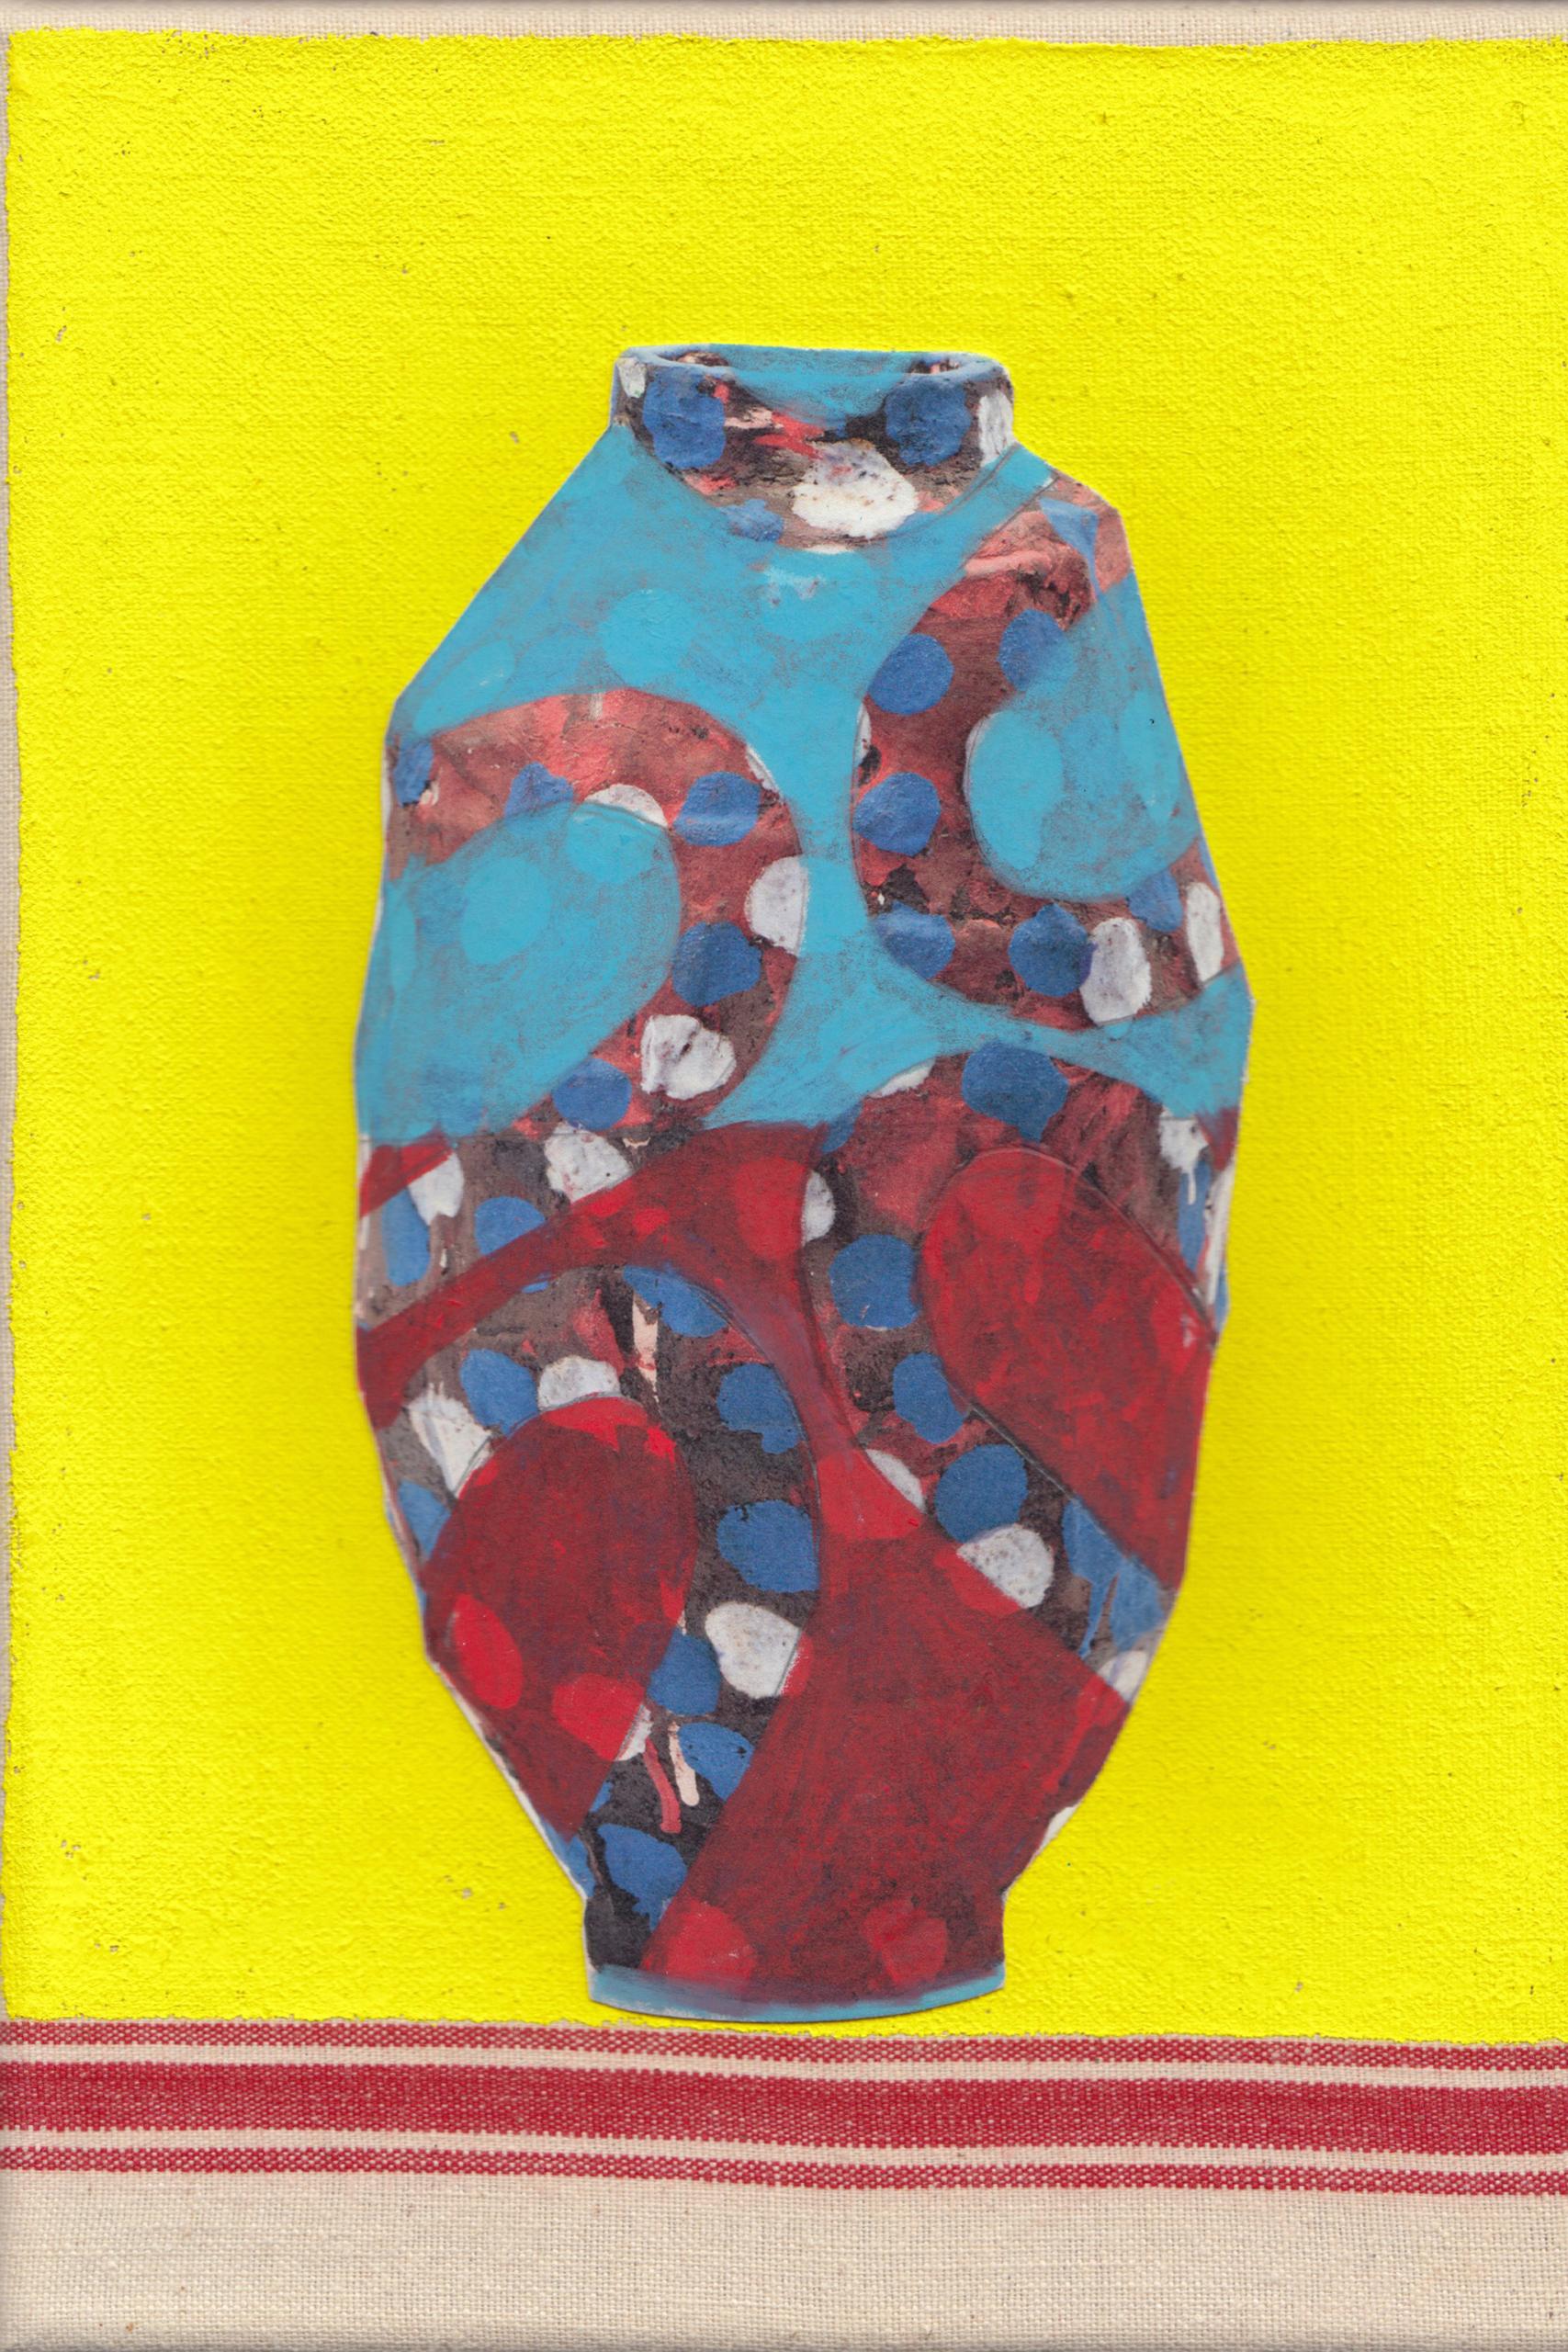 Elke Sada - Vase im Zitronengelb -